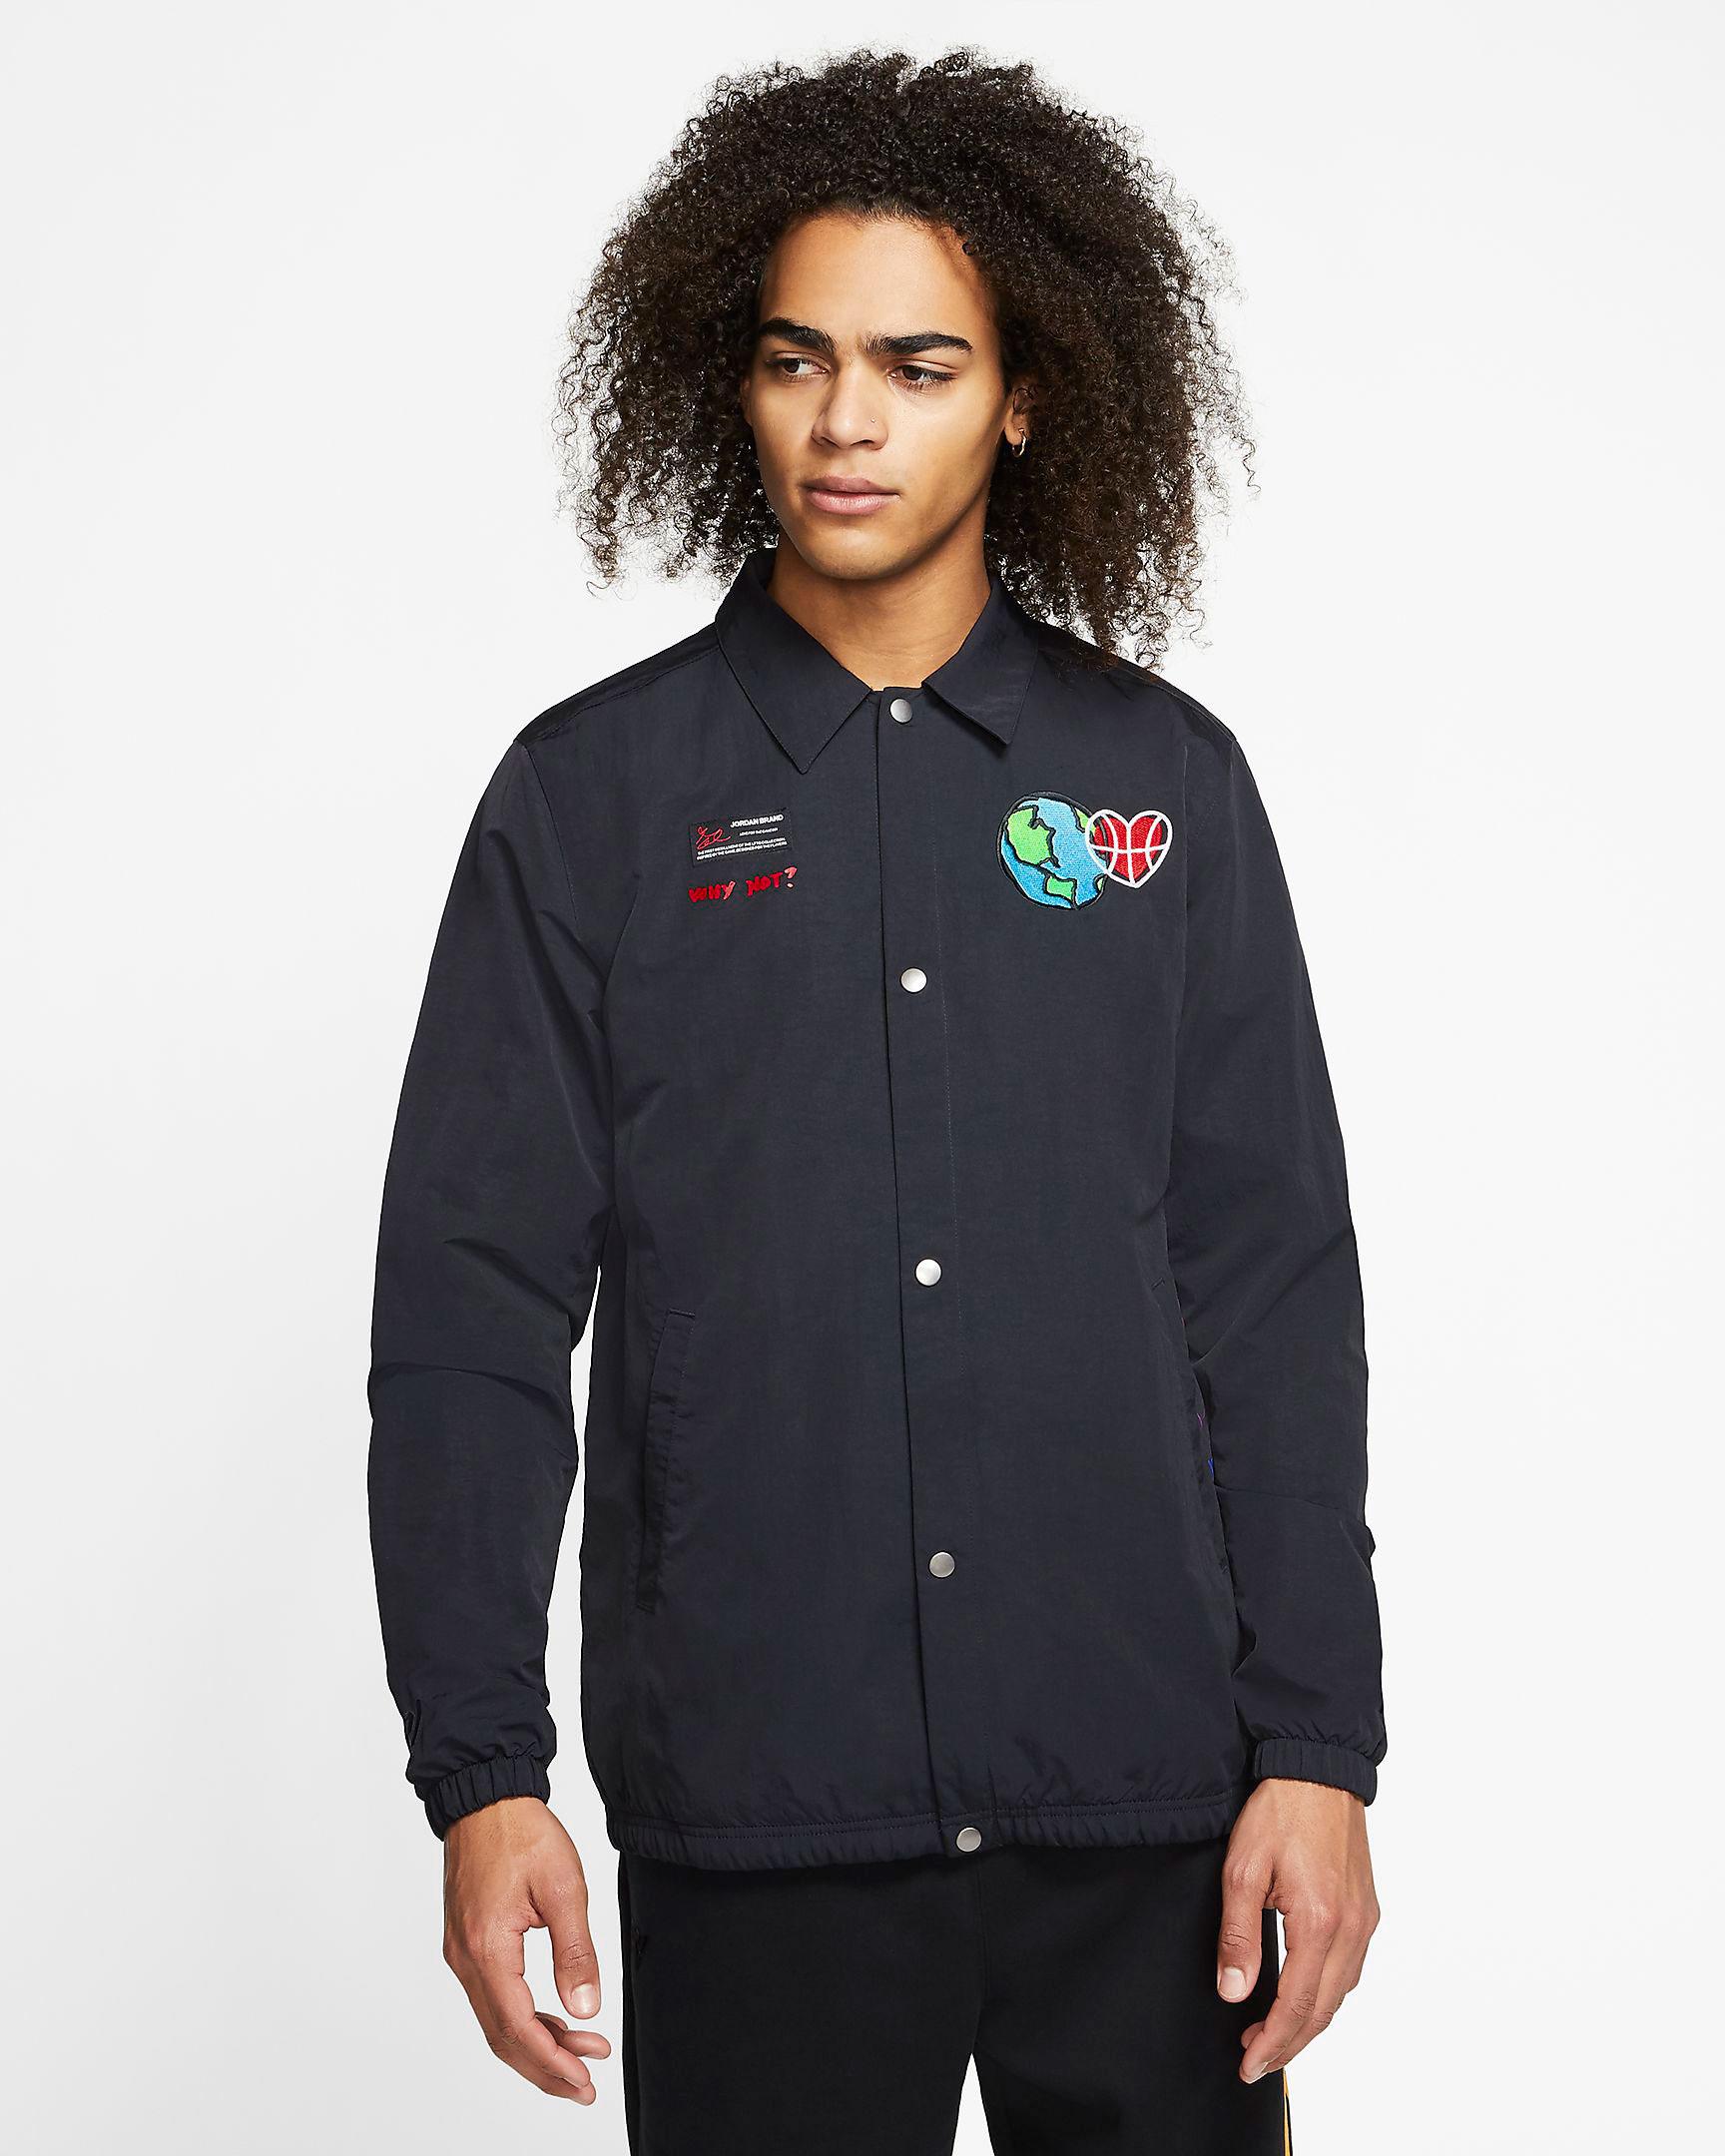 jordan-westbrook-why-not-zer03-jacket-black-1